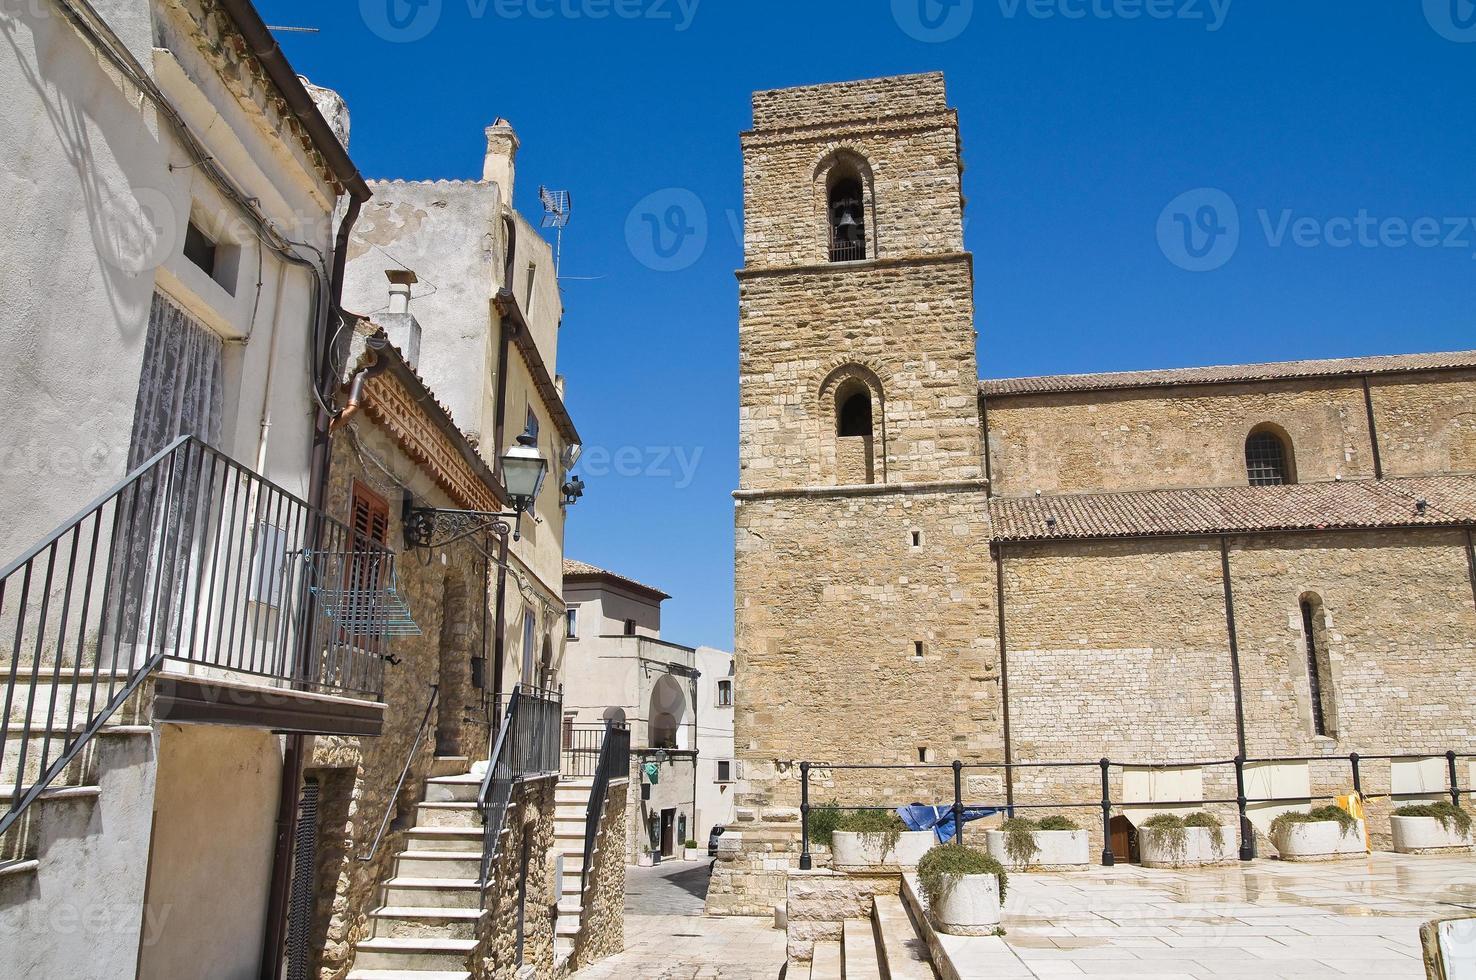 kathedraal van acerenza. basilicata. Italië. foto